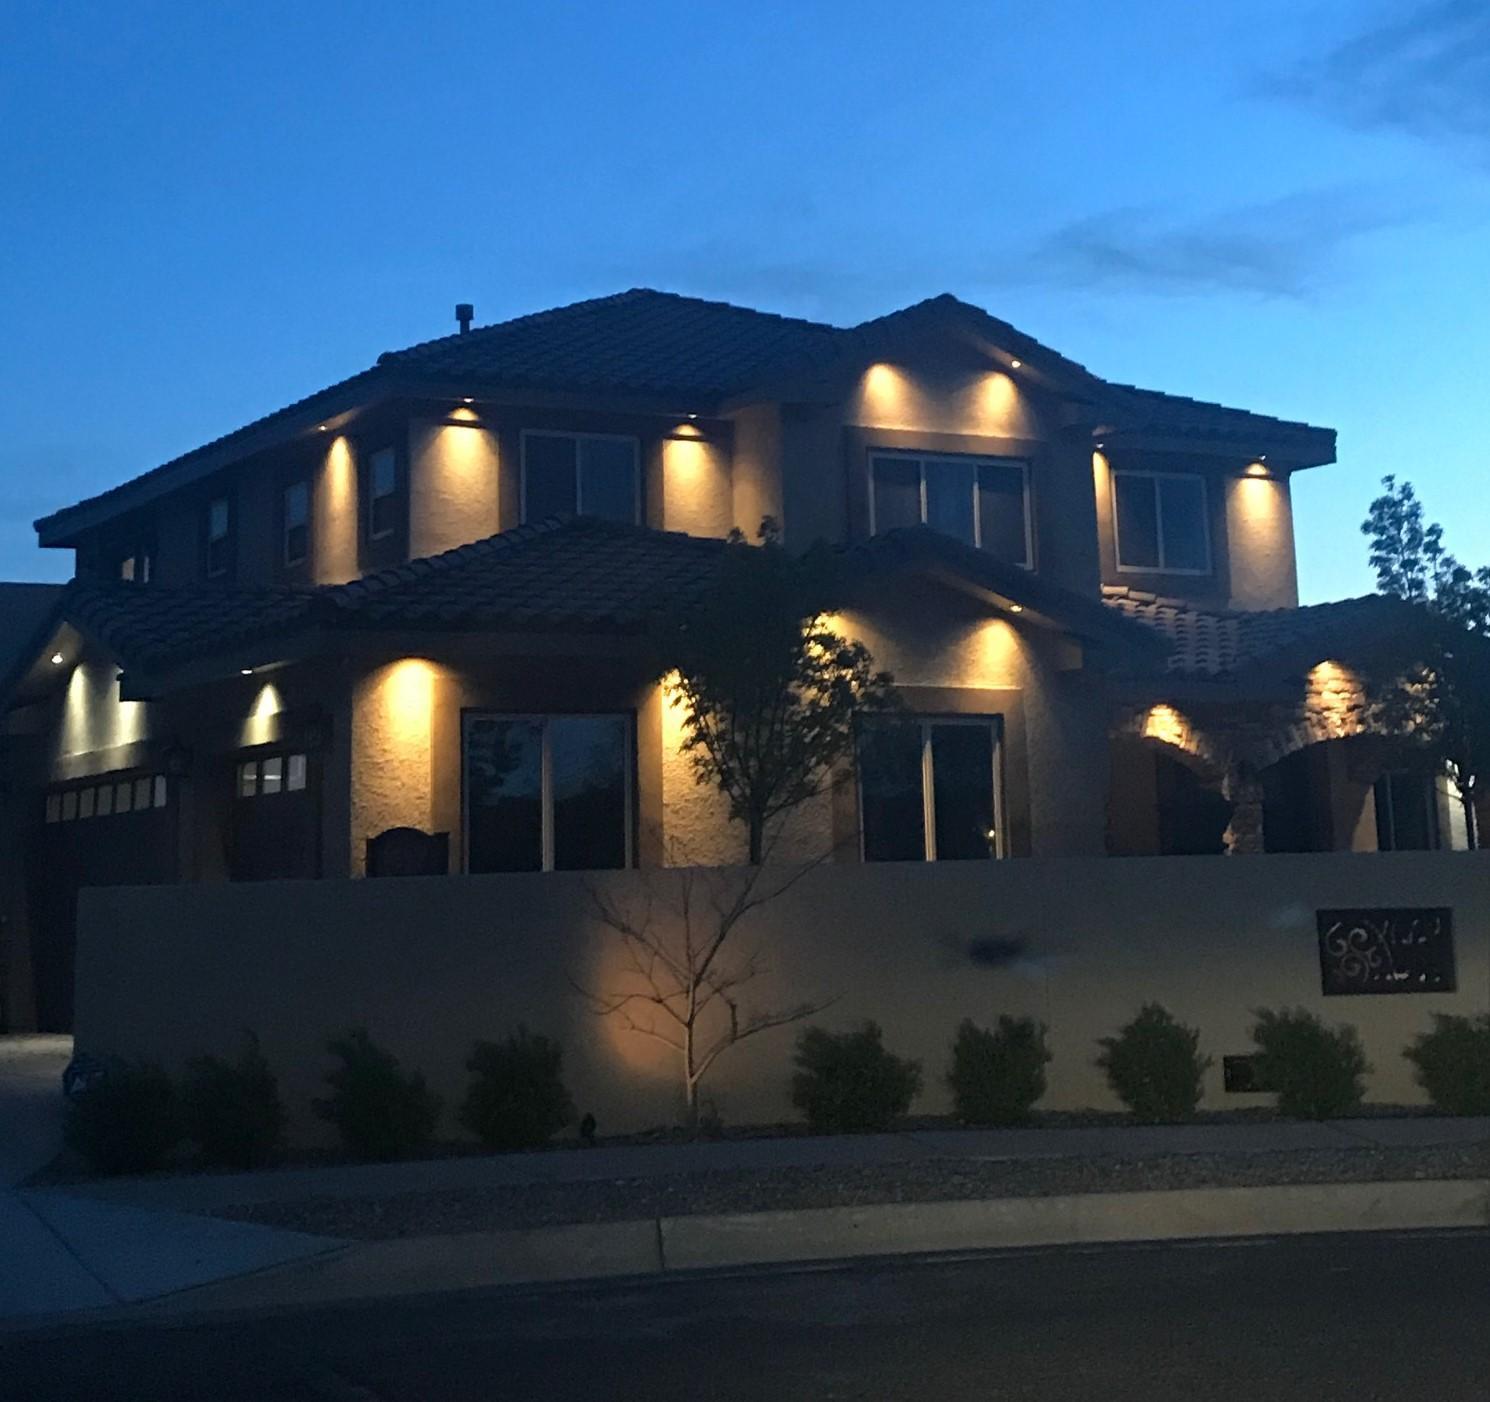 2308 NW La Vista Court, Northwest Albuquerque and Northwest Heights, New Mexico